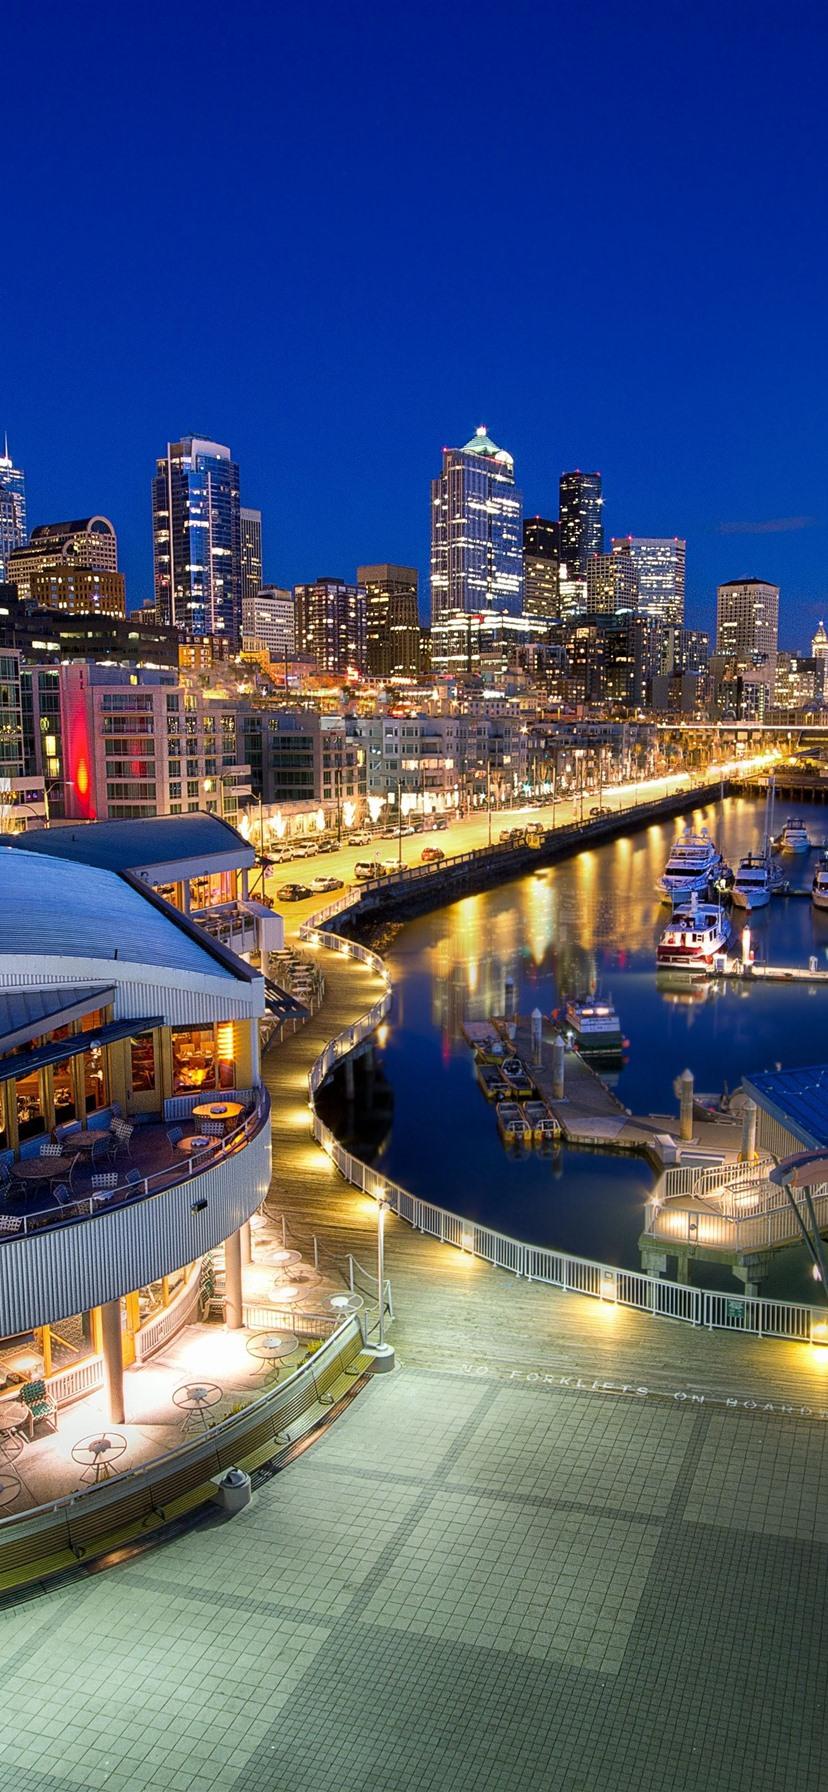 Wallpaper Seattle Night City Pier Boats Lights Usa